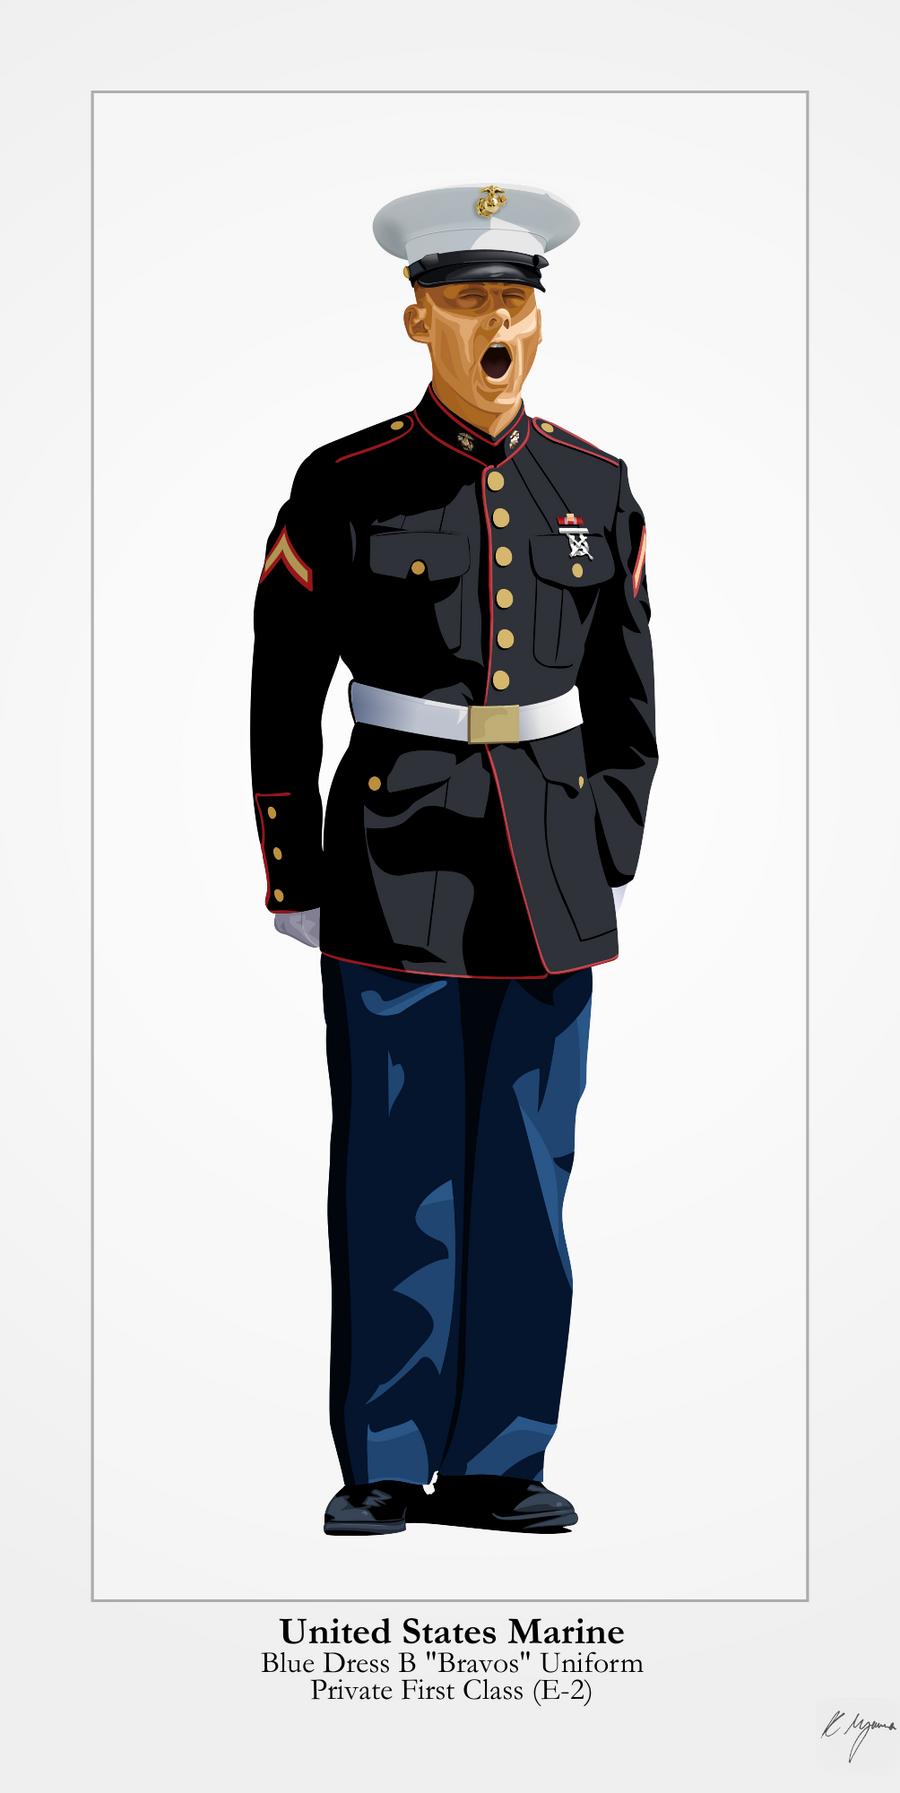 Marine corps dress uniform regulations